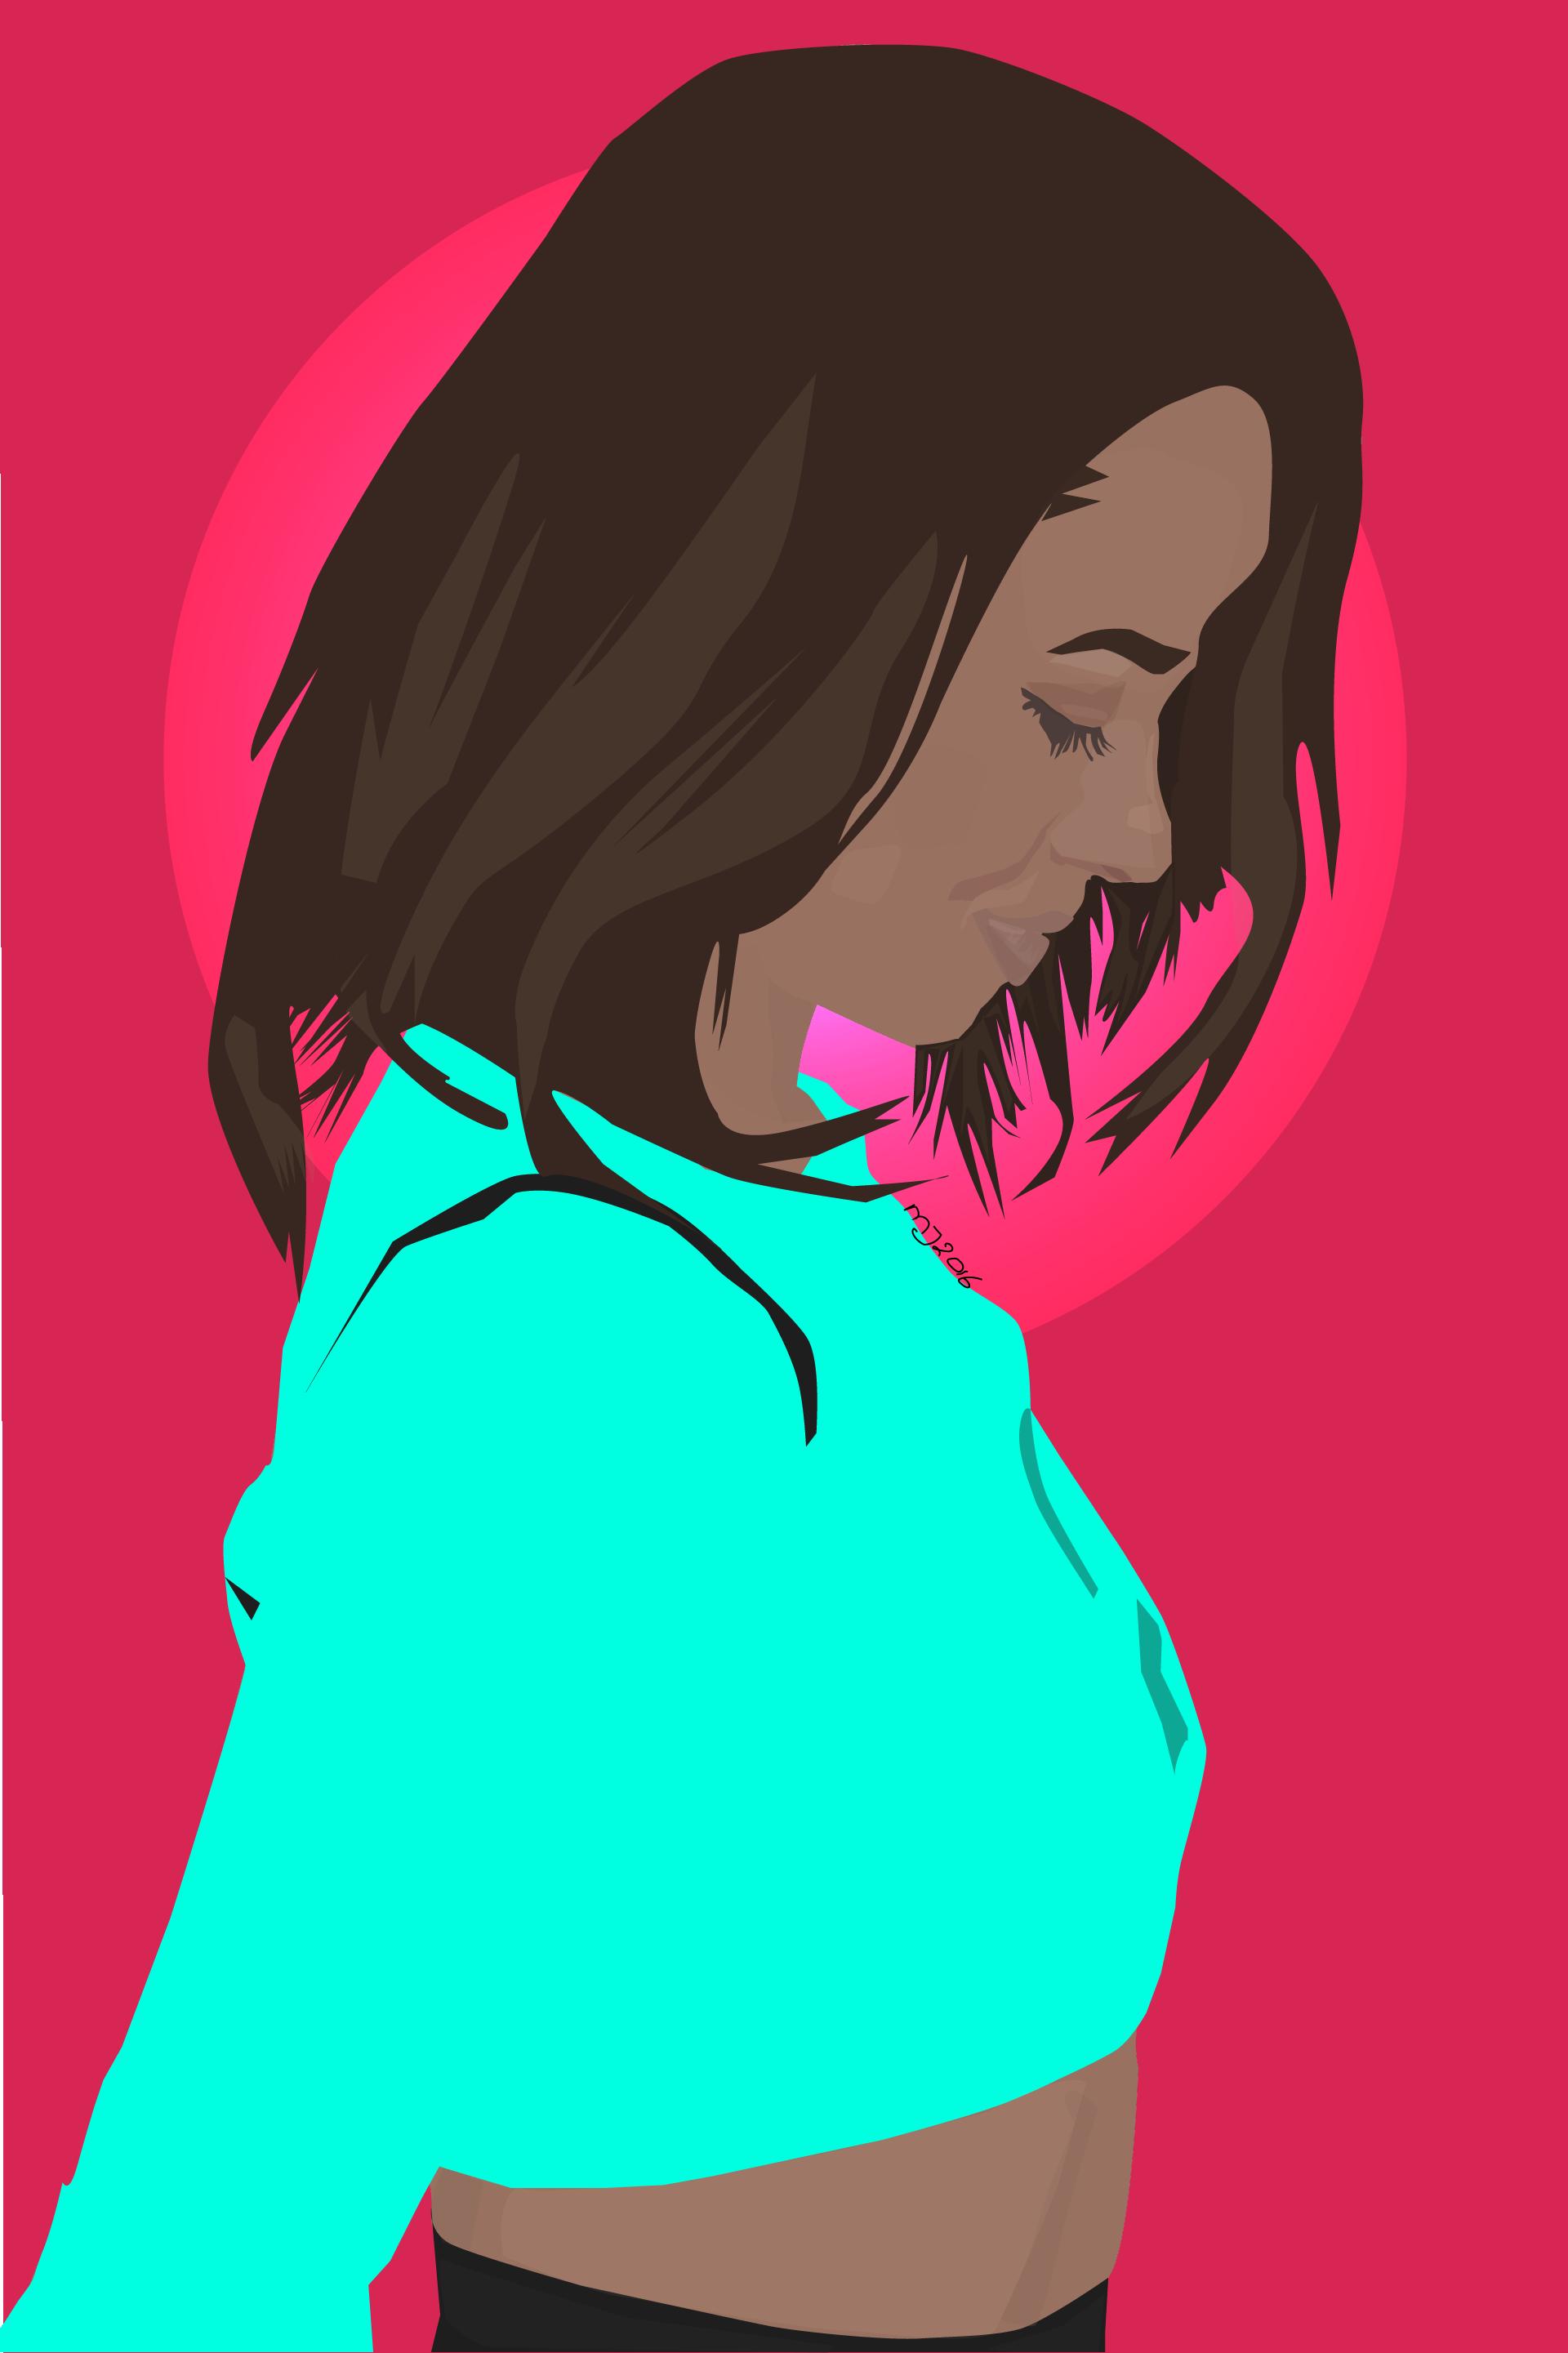 Kat Graham - Adobe Illustrator